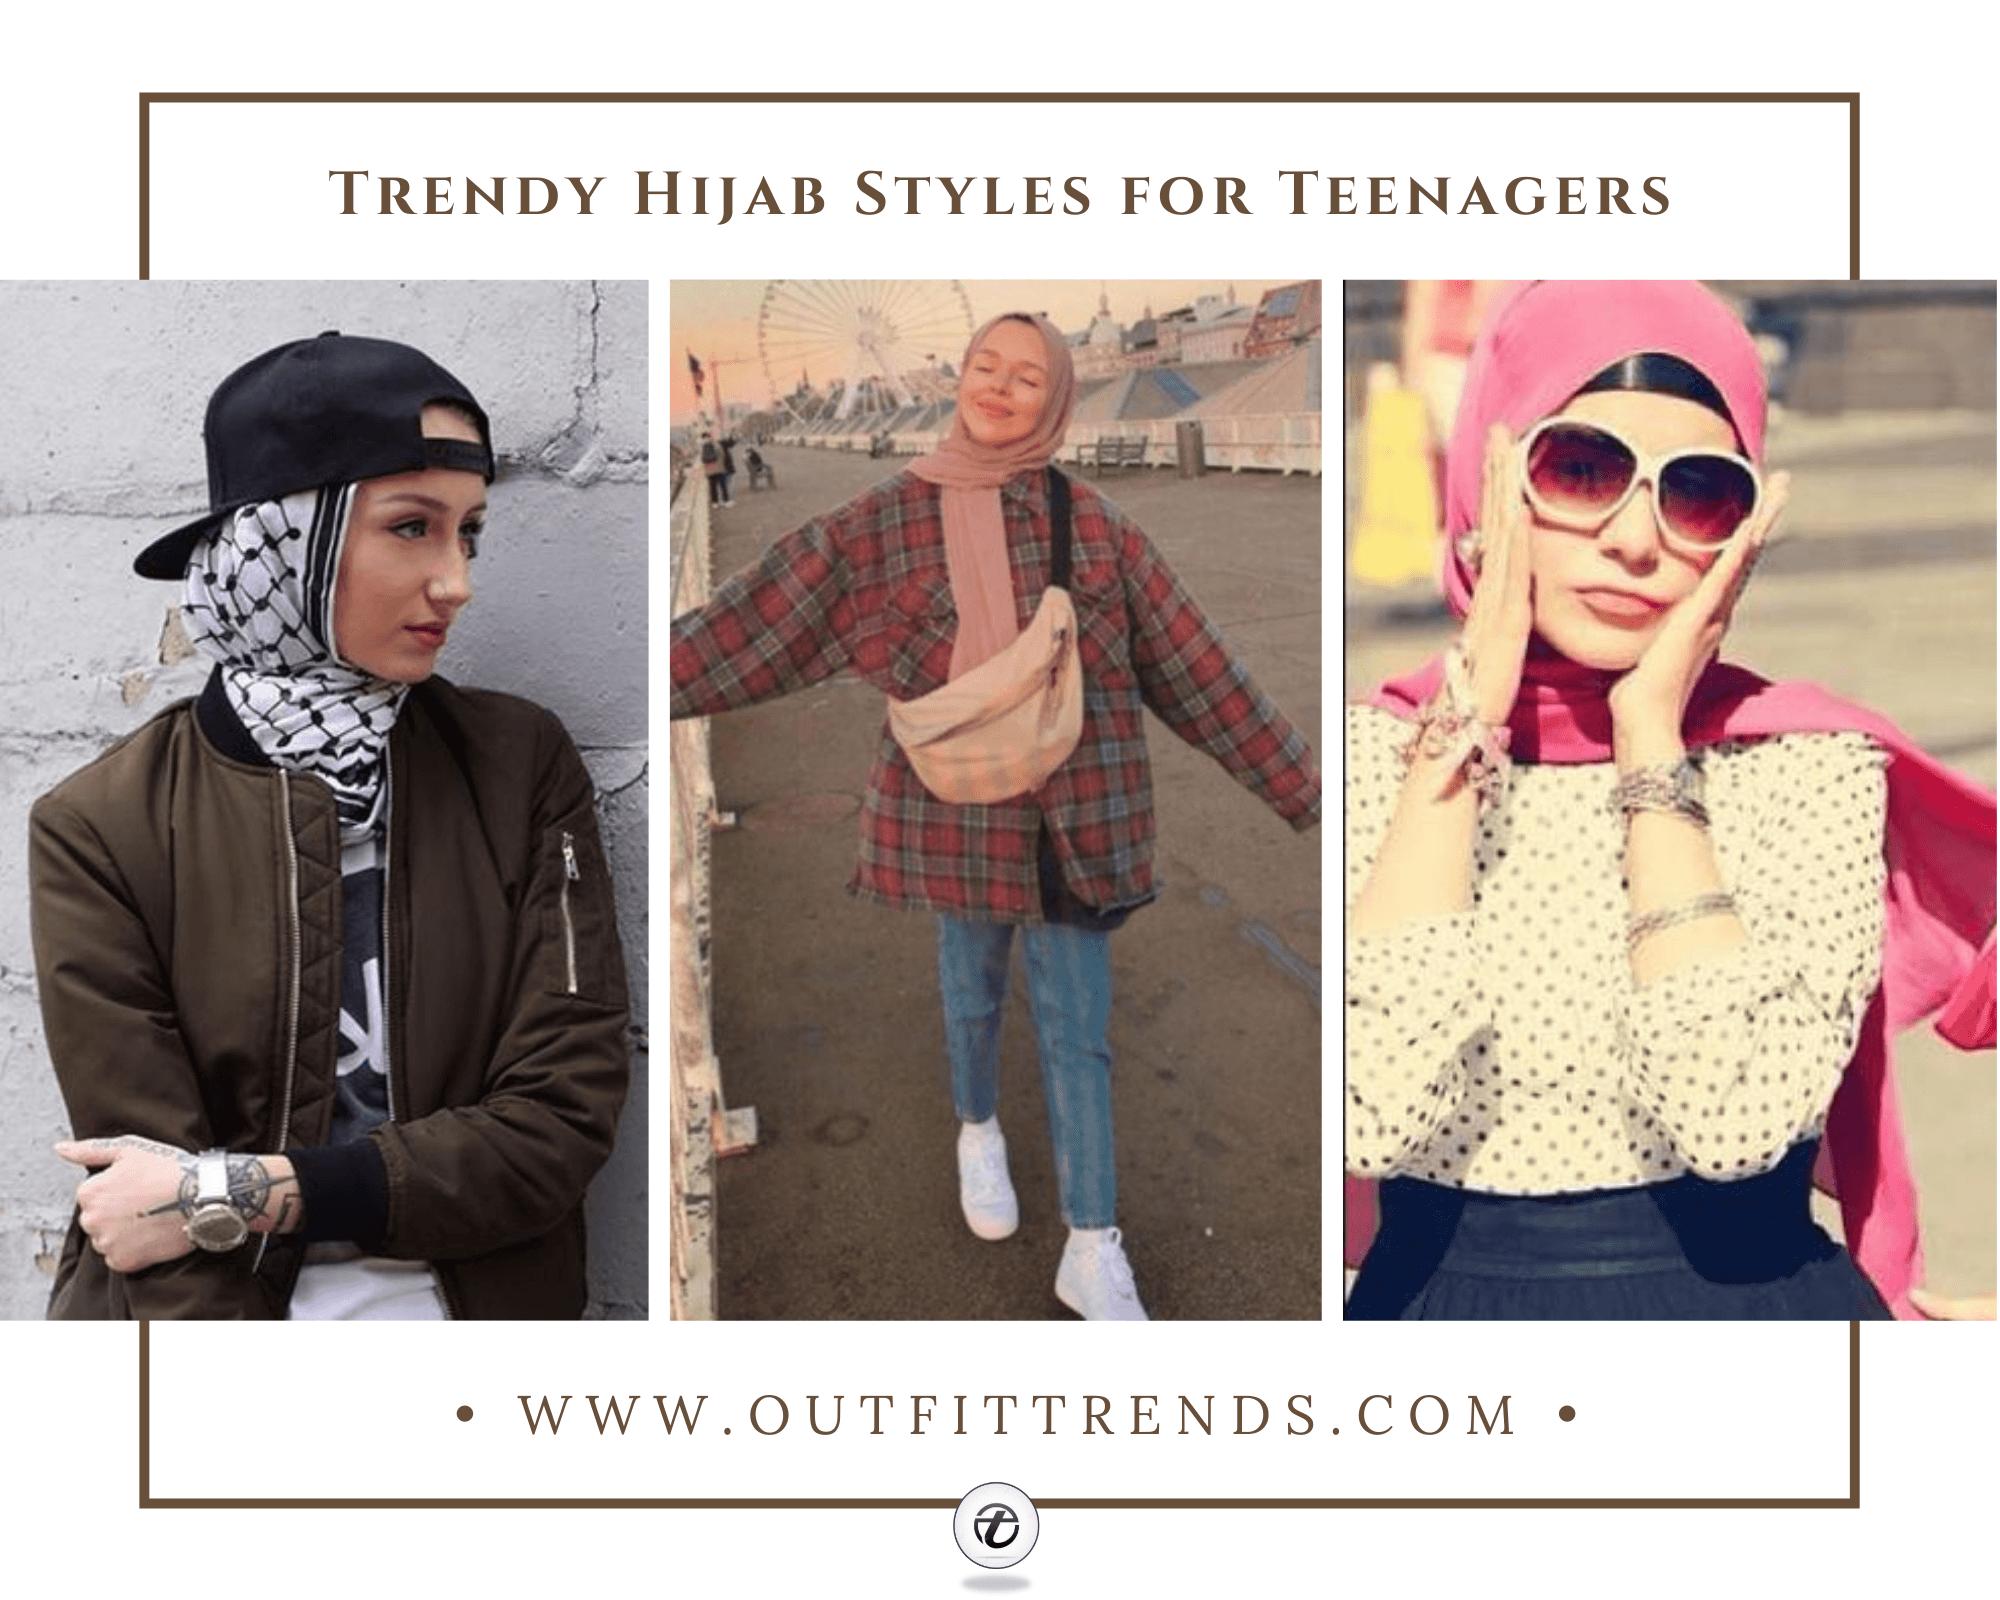 Hijab Outfits for Teenage Girls 25 Cool Hijab Style Looks